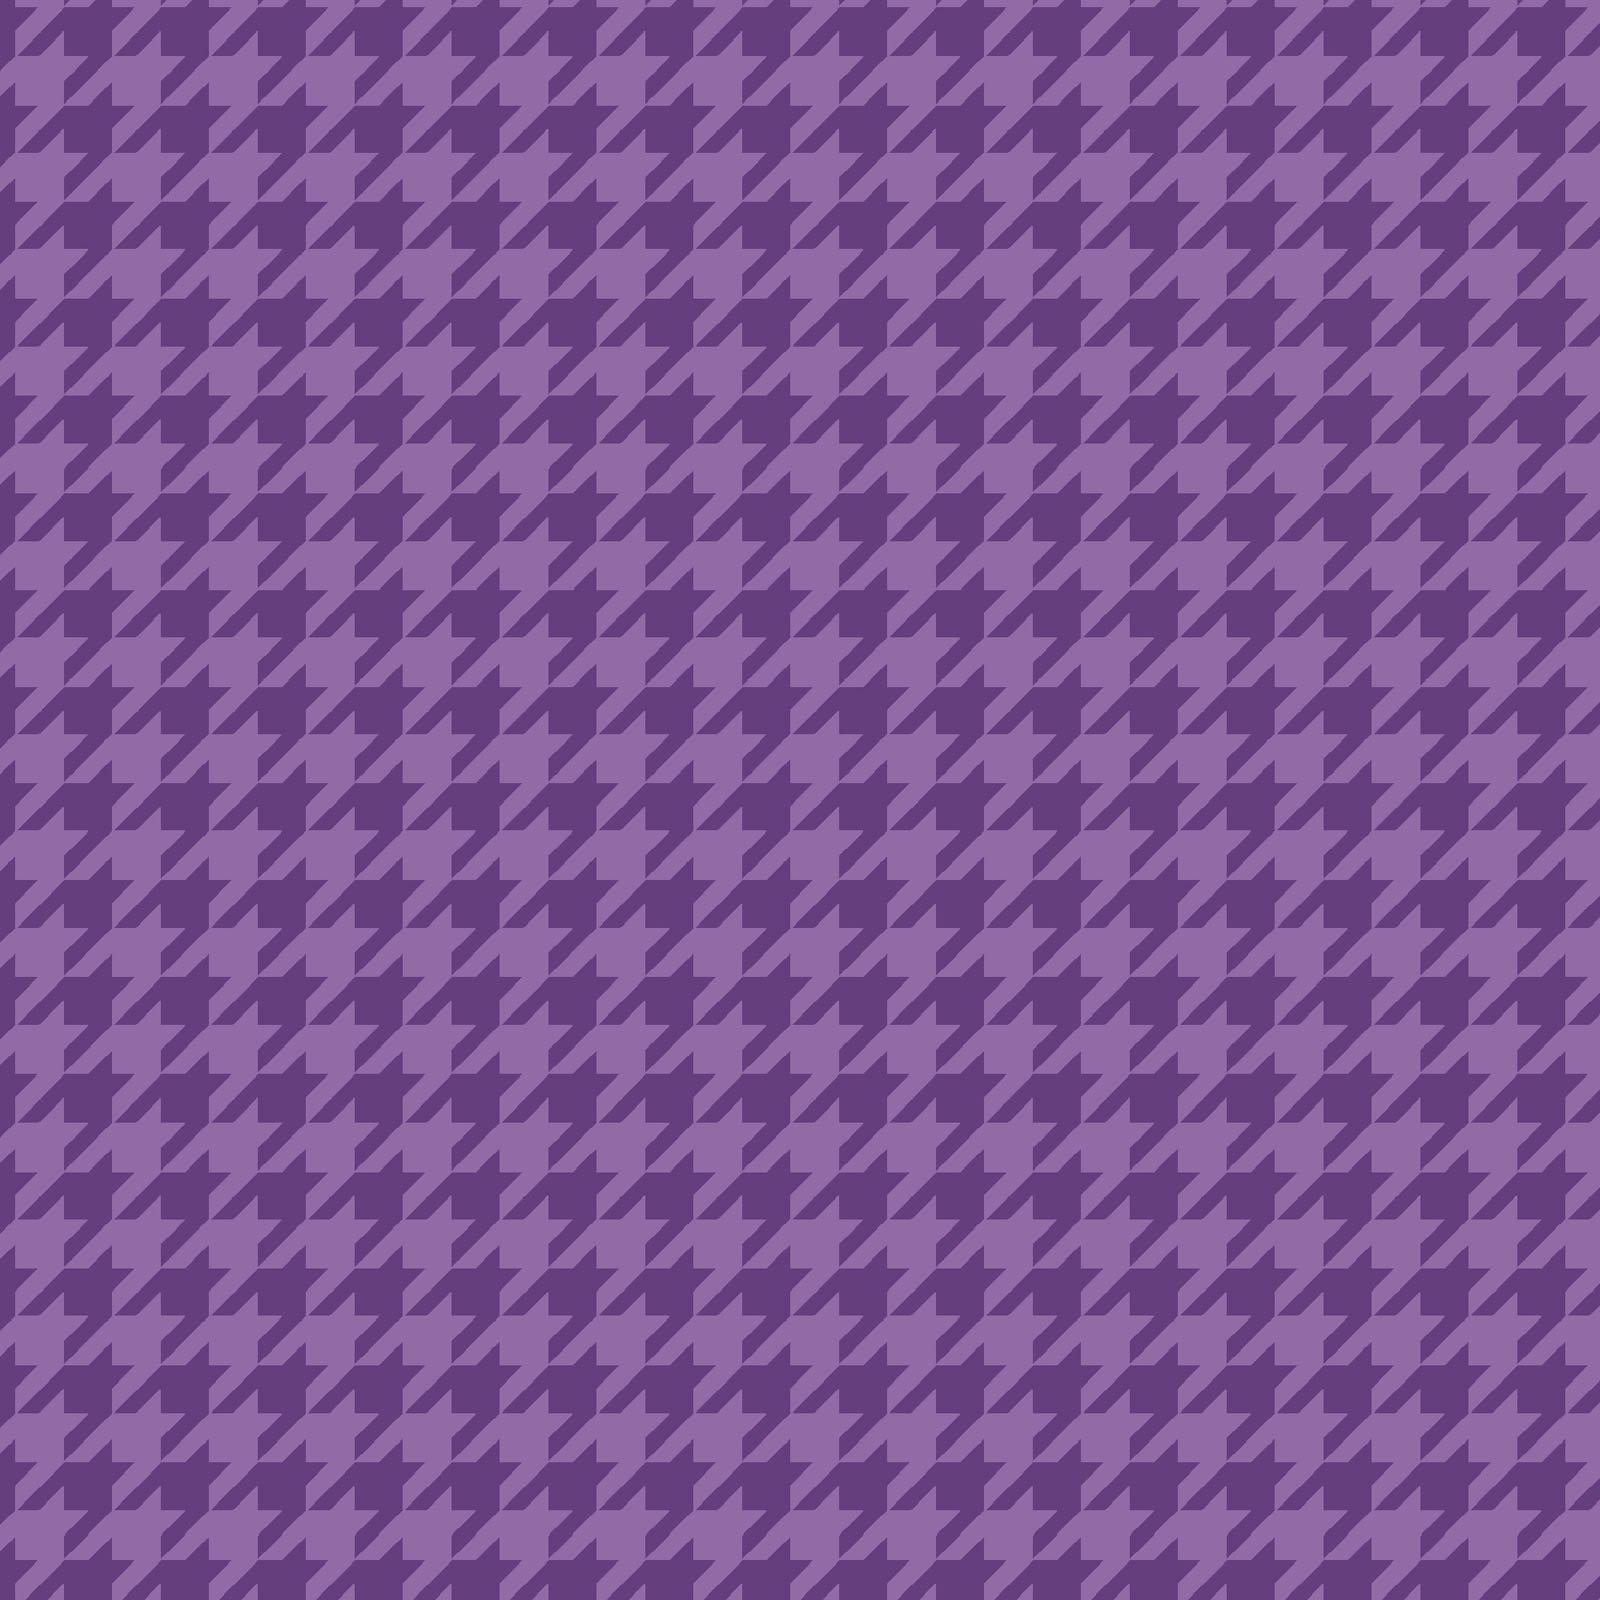 KimberBell Basics Violet Houndstooth 8206M-VV